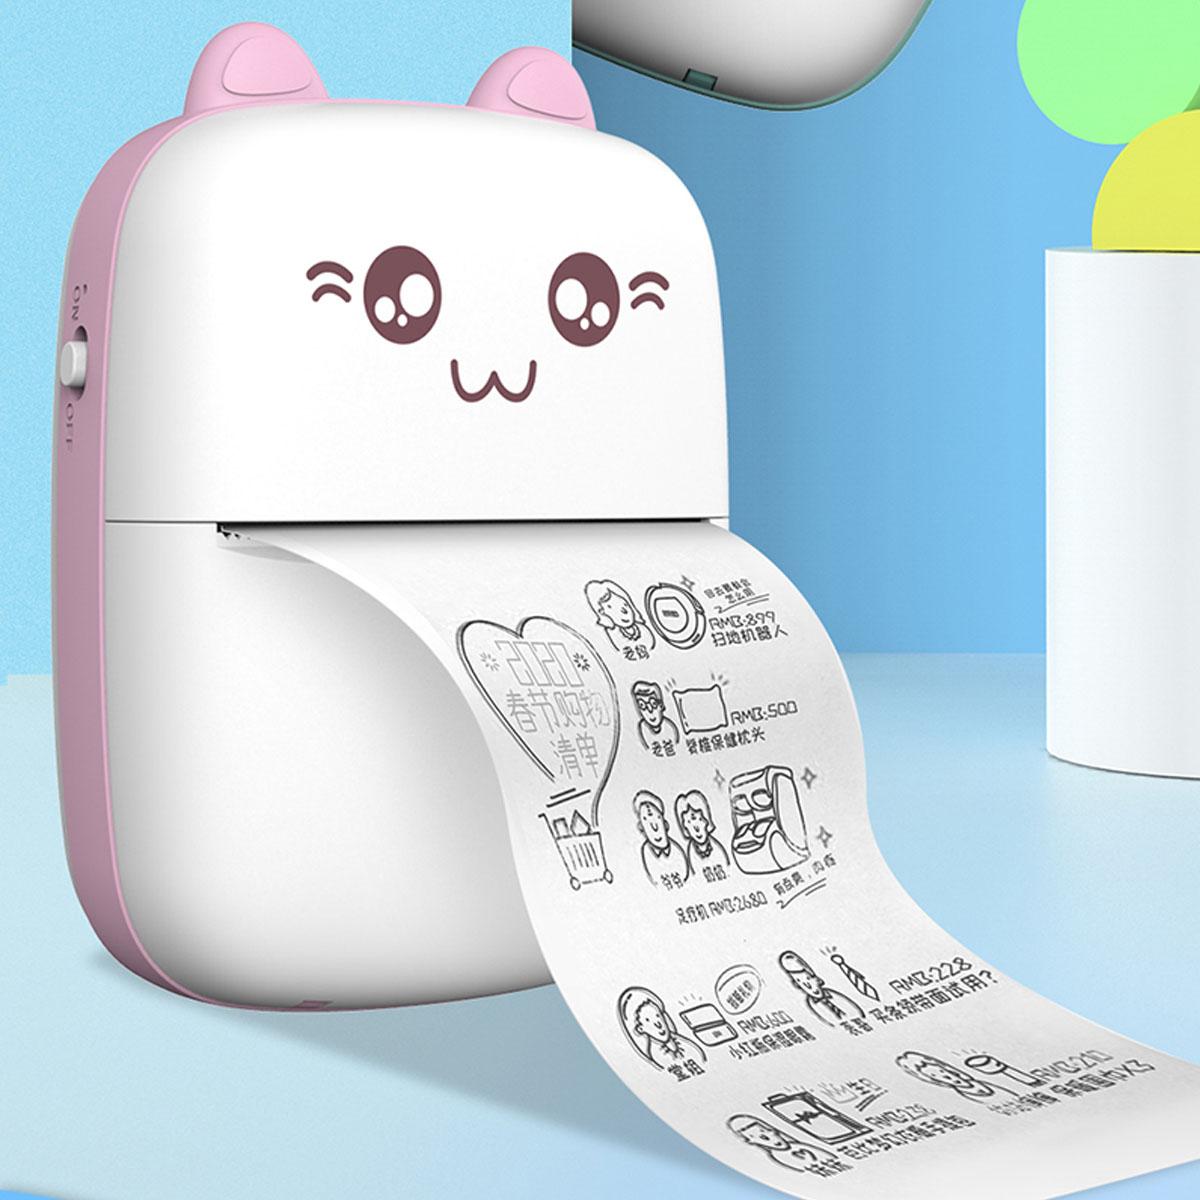 PeriPage Thermal Printer Photo Webpage Printer Pocket Paper Thermal Printer USB Charging Portable Printer for Mobile Phone